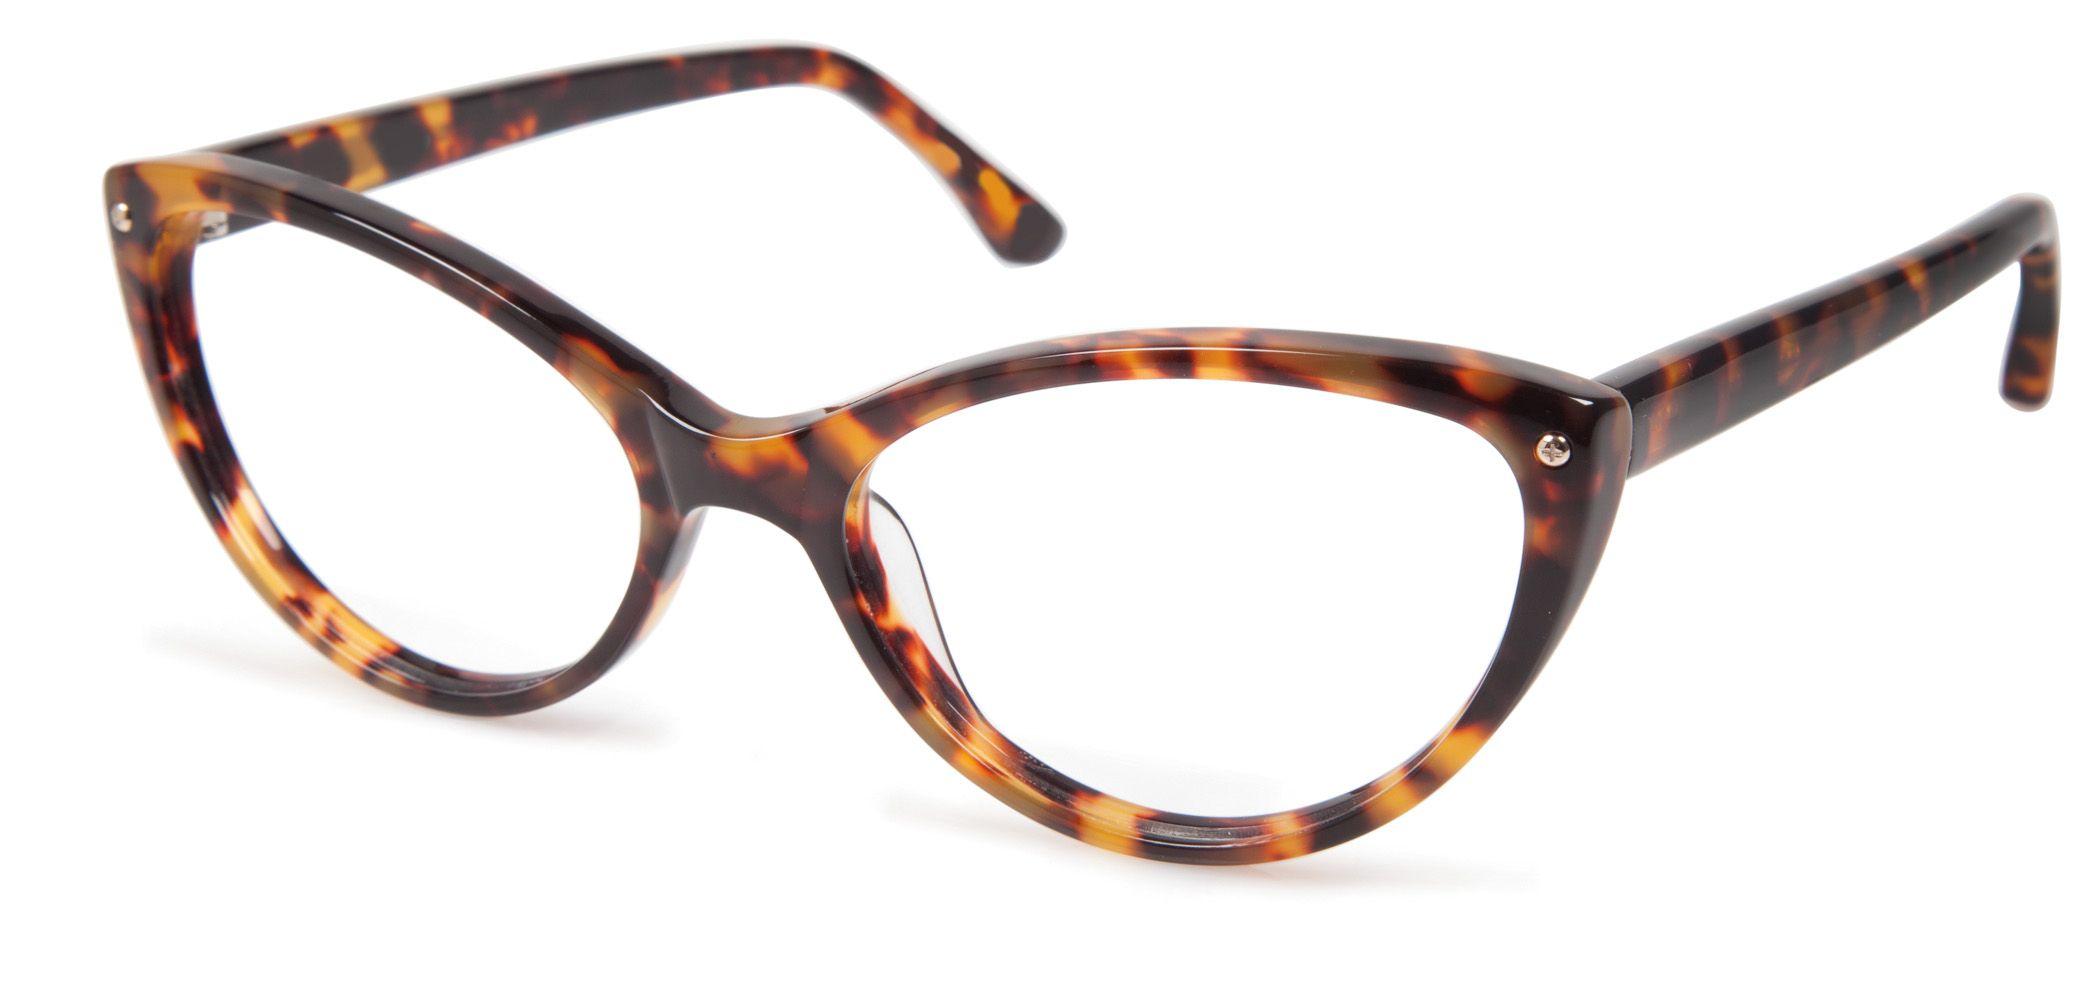 No.50 Glasses - Designer Frames For Women | Rowley Eyewear | Frames ...